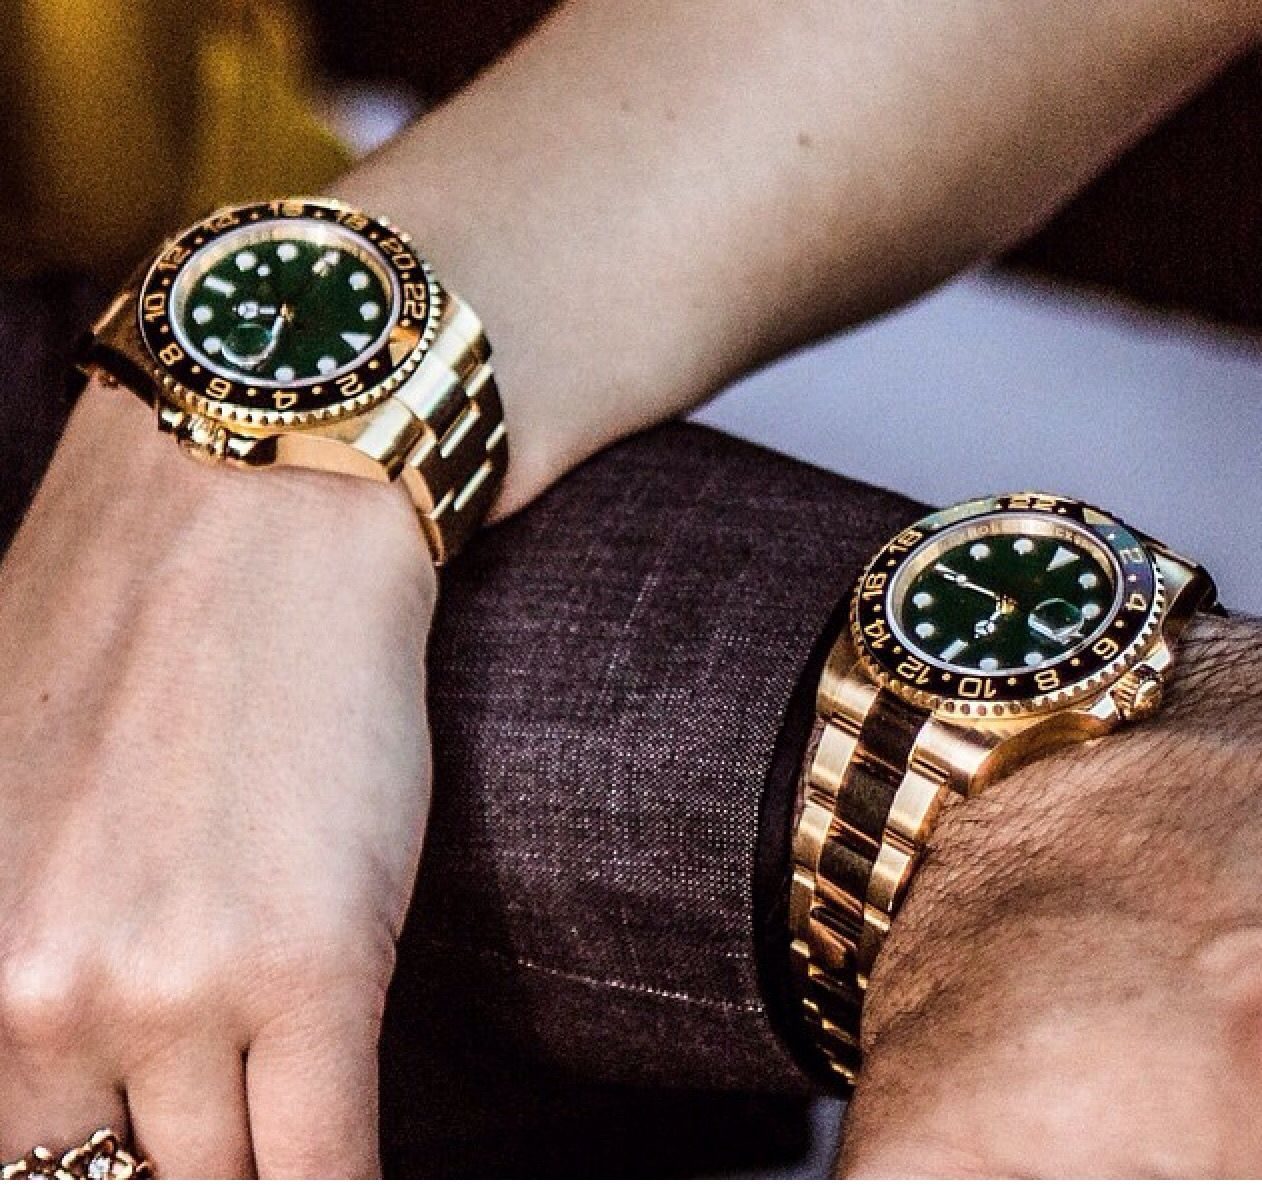 Rolex Gmt Gold 18k Watches In 2018 Pinterest Bulova 90271 Jam Tangan Pria Silver